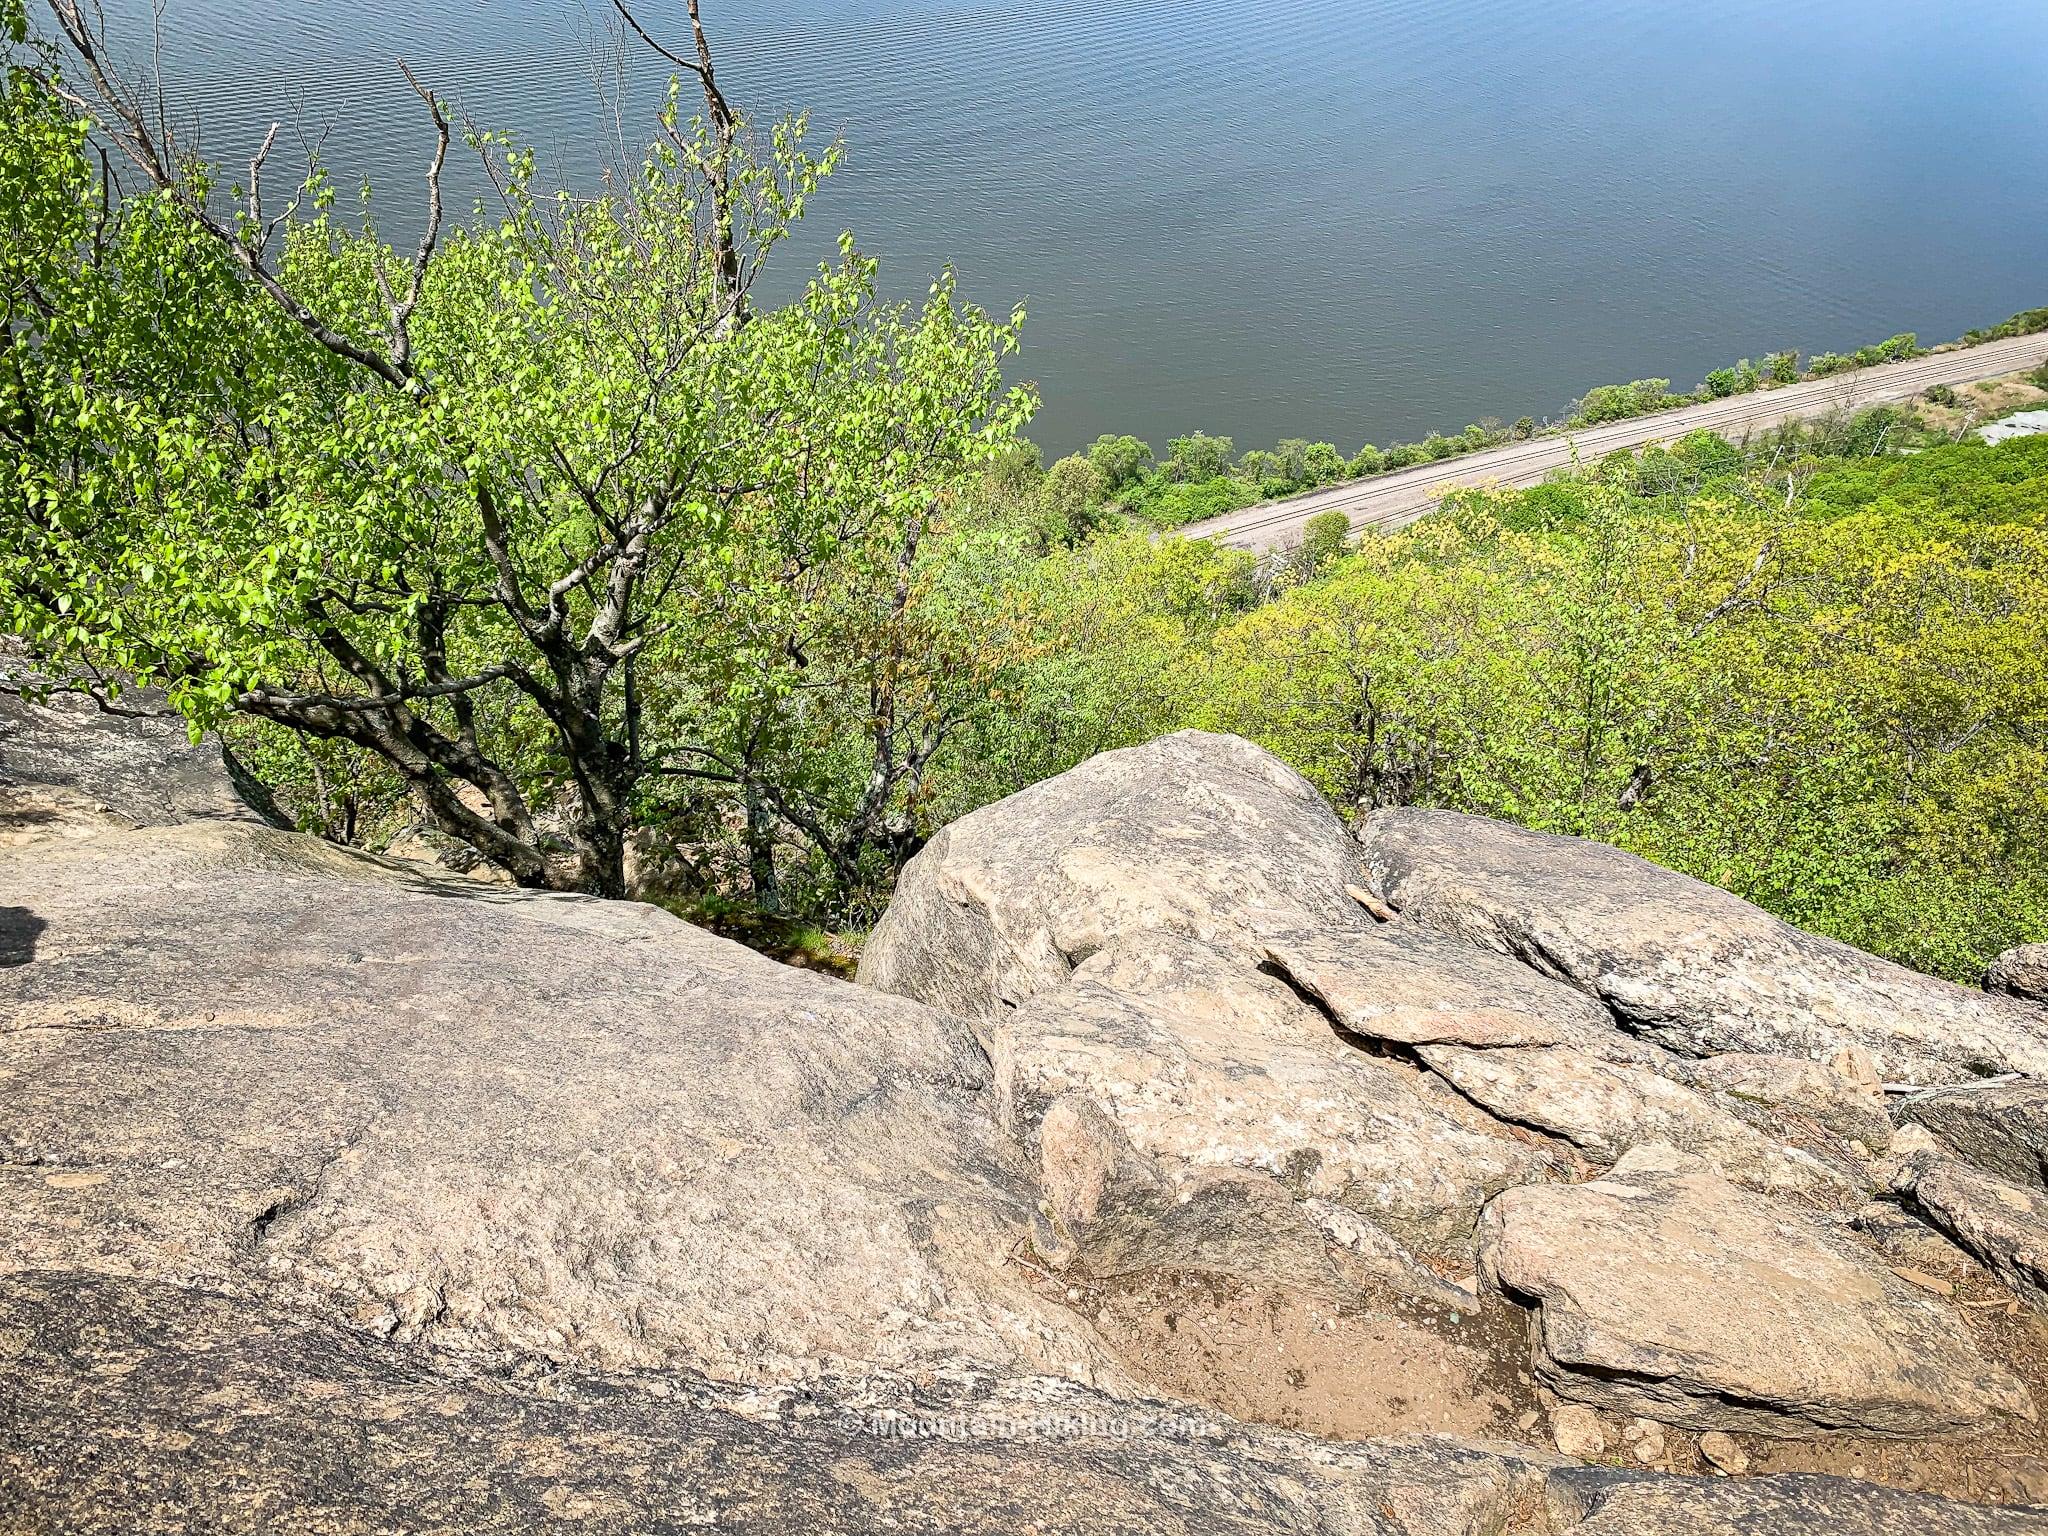 Breakneck Ridge, the super sketchy bit